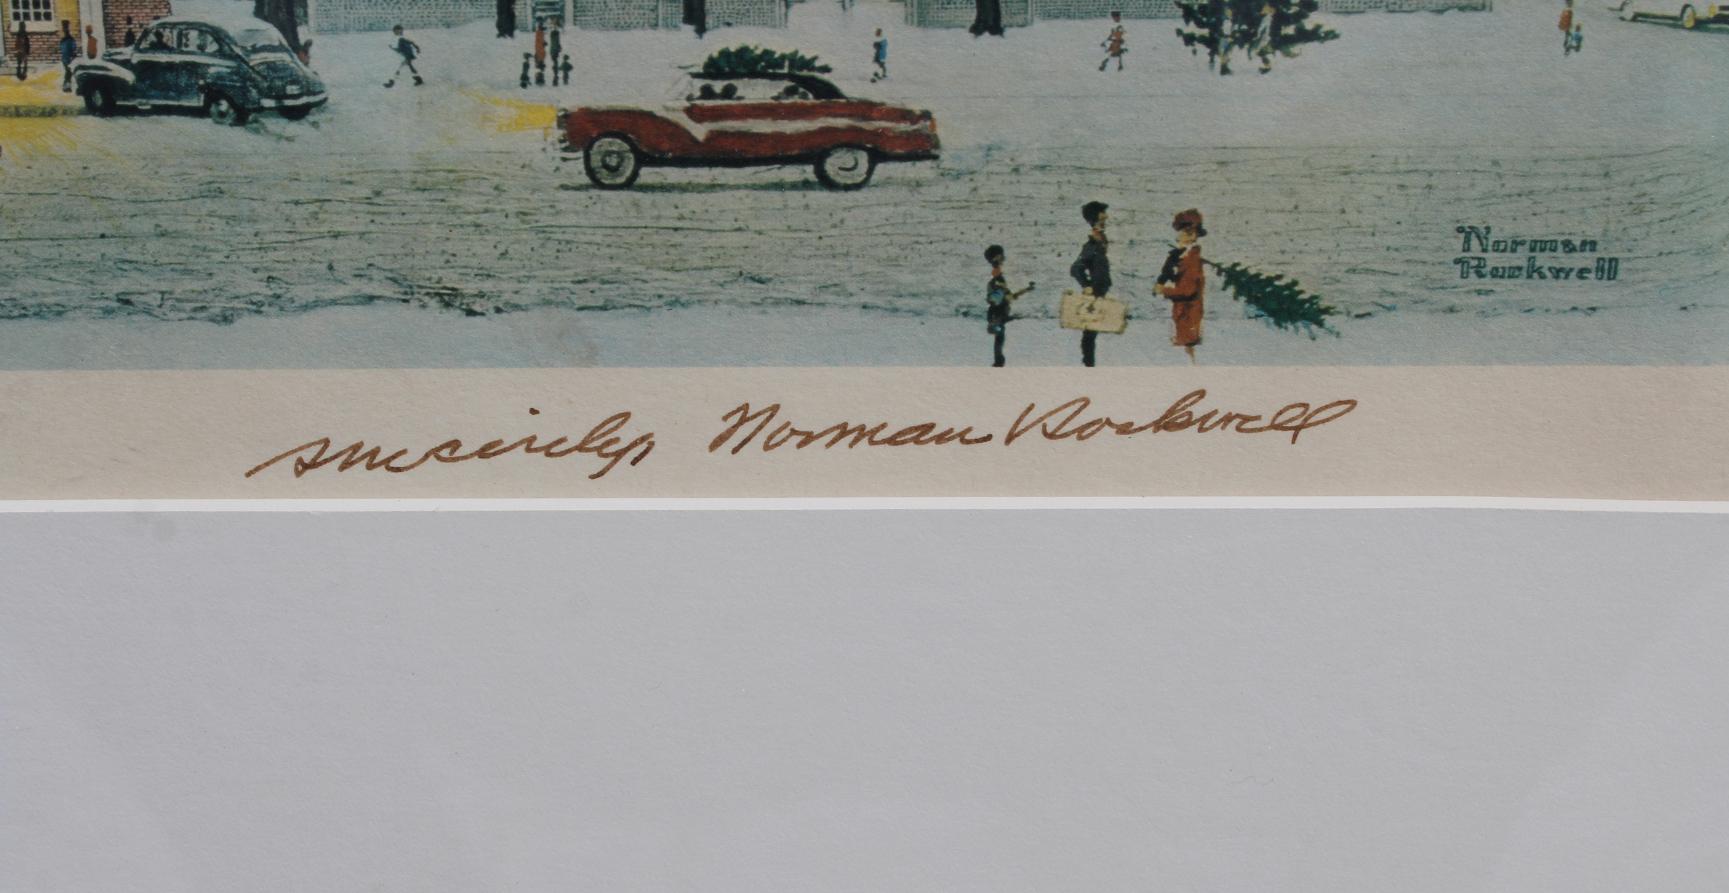 "Norman Rockwell ""Main Street Stockbridge 1967"" - Image 3 of 3"